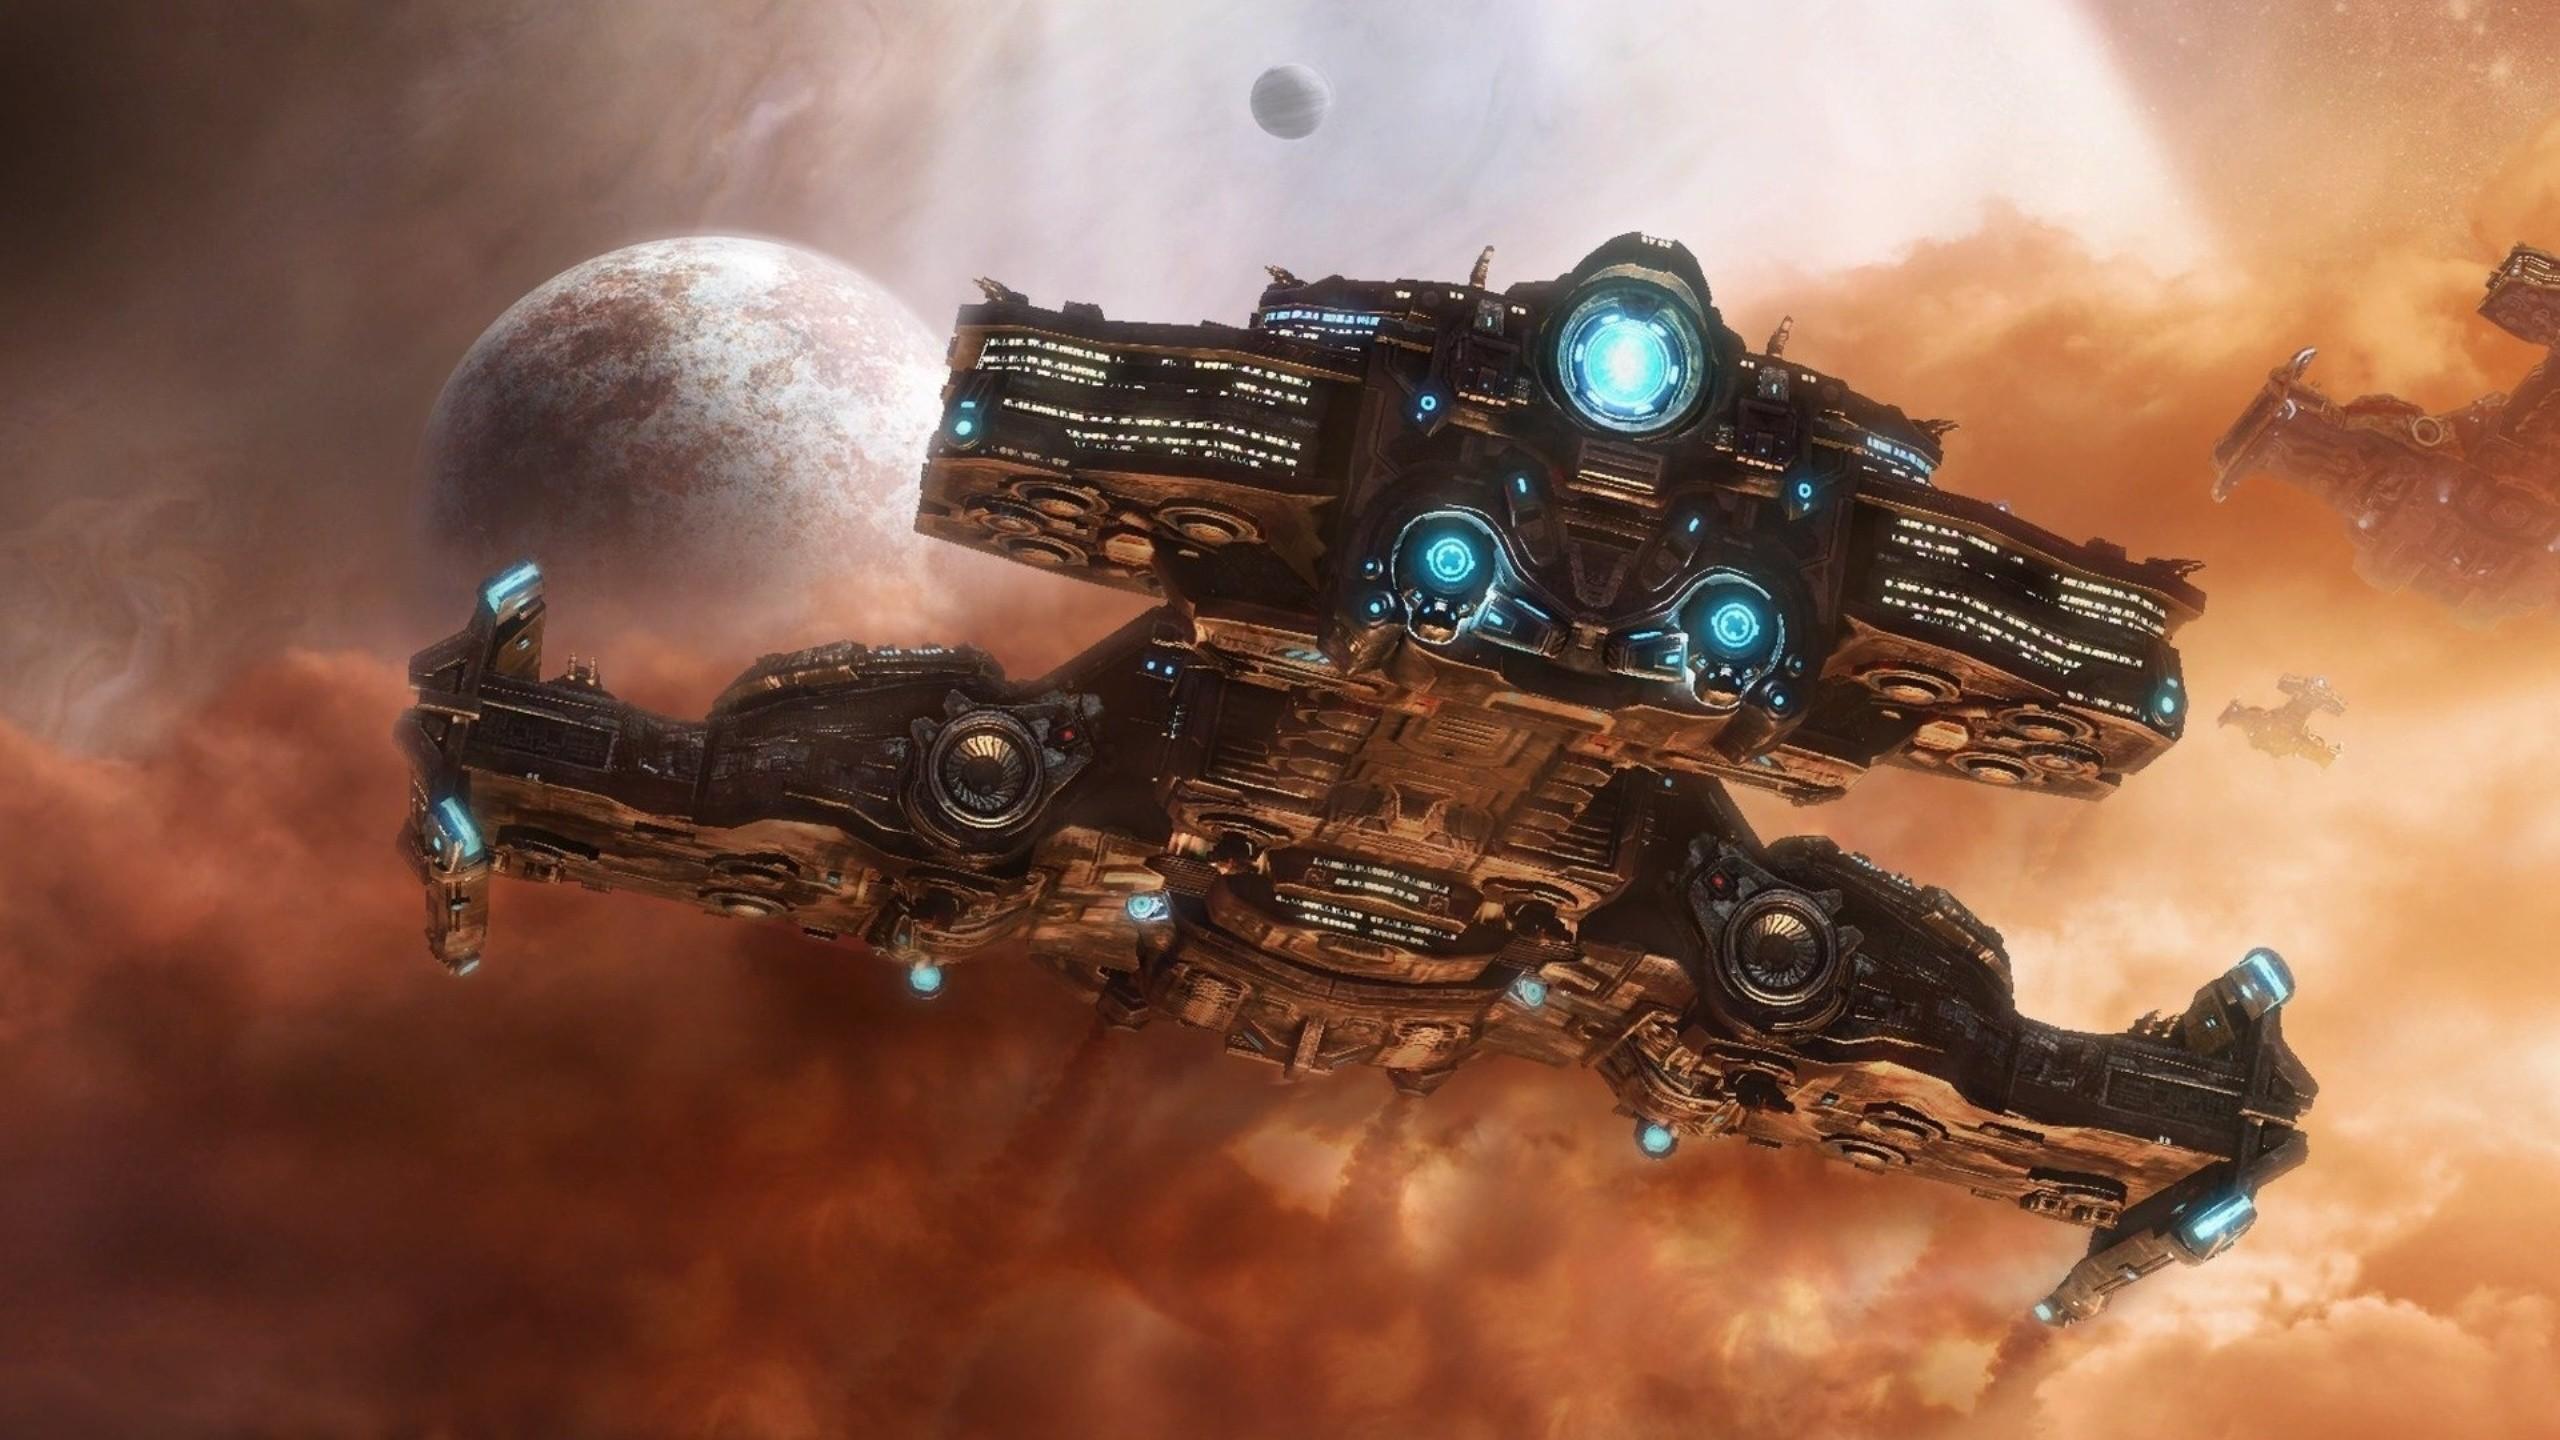 Spaceships Fantasy Spaceship Wallpaper 1920x1200 px Free Download ...